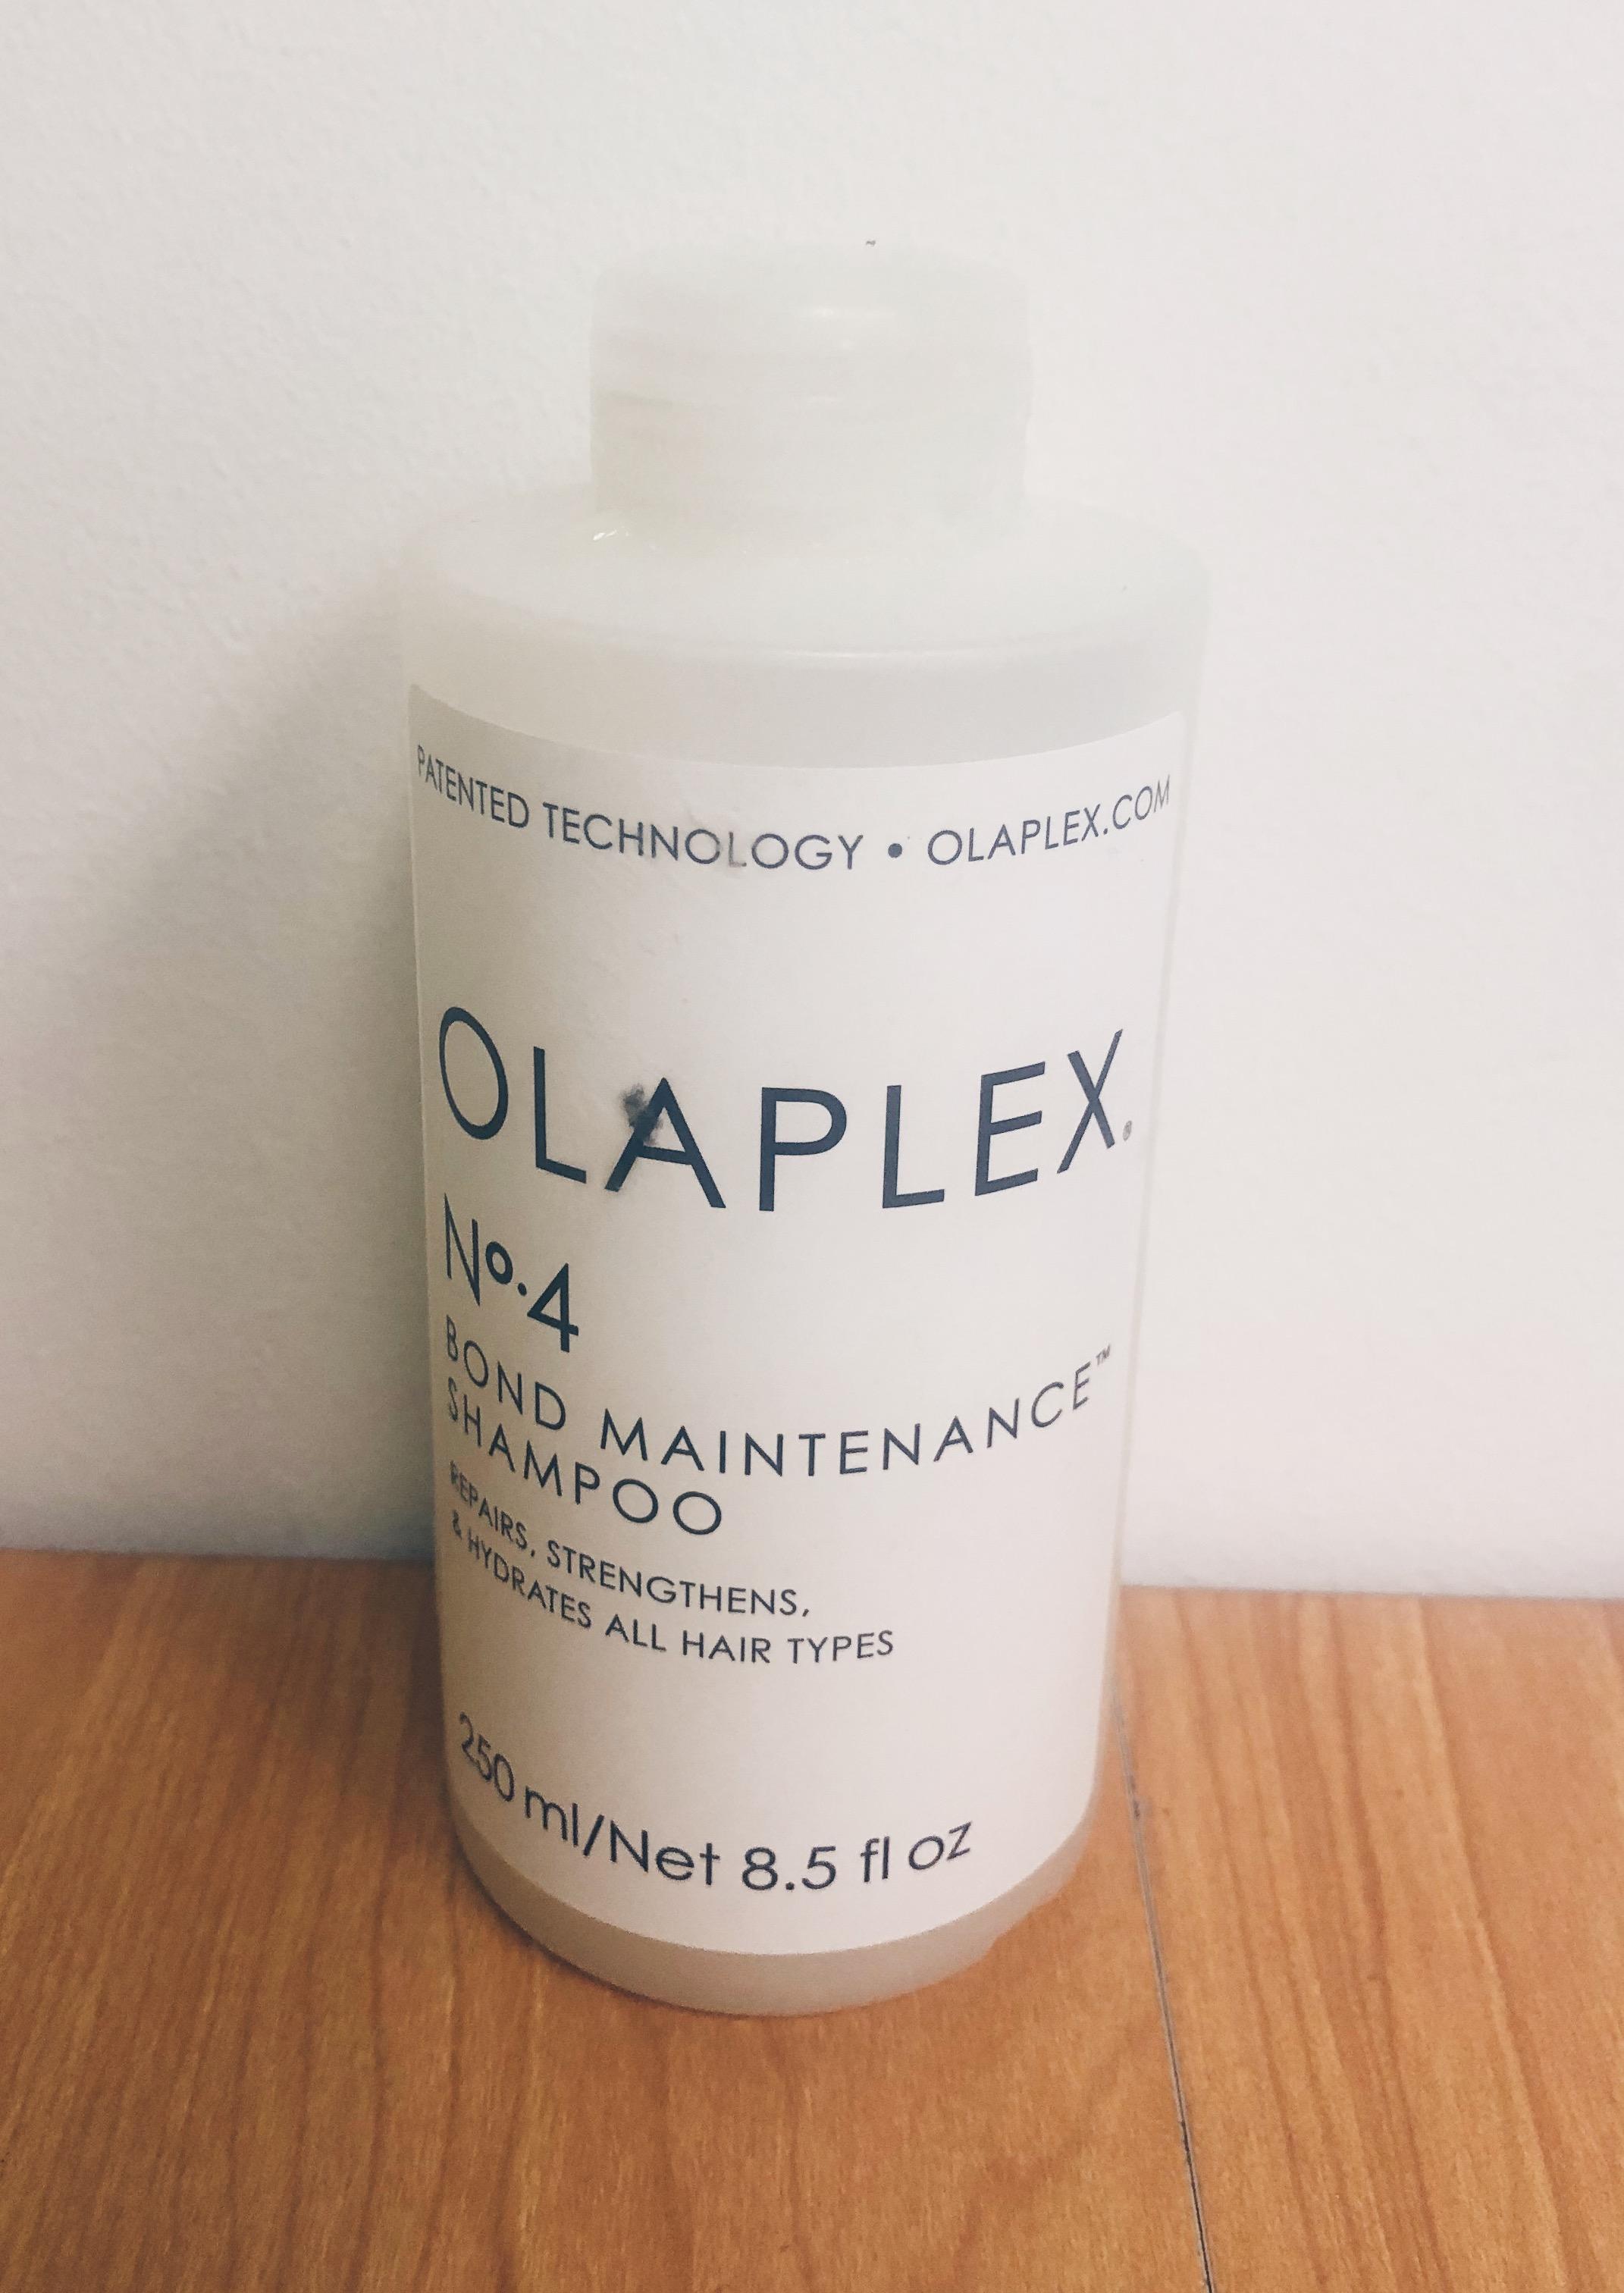 ladyofspotsolaplexshampoo.jpeg